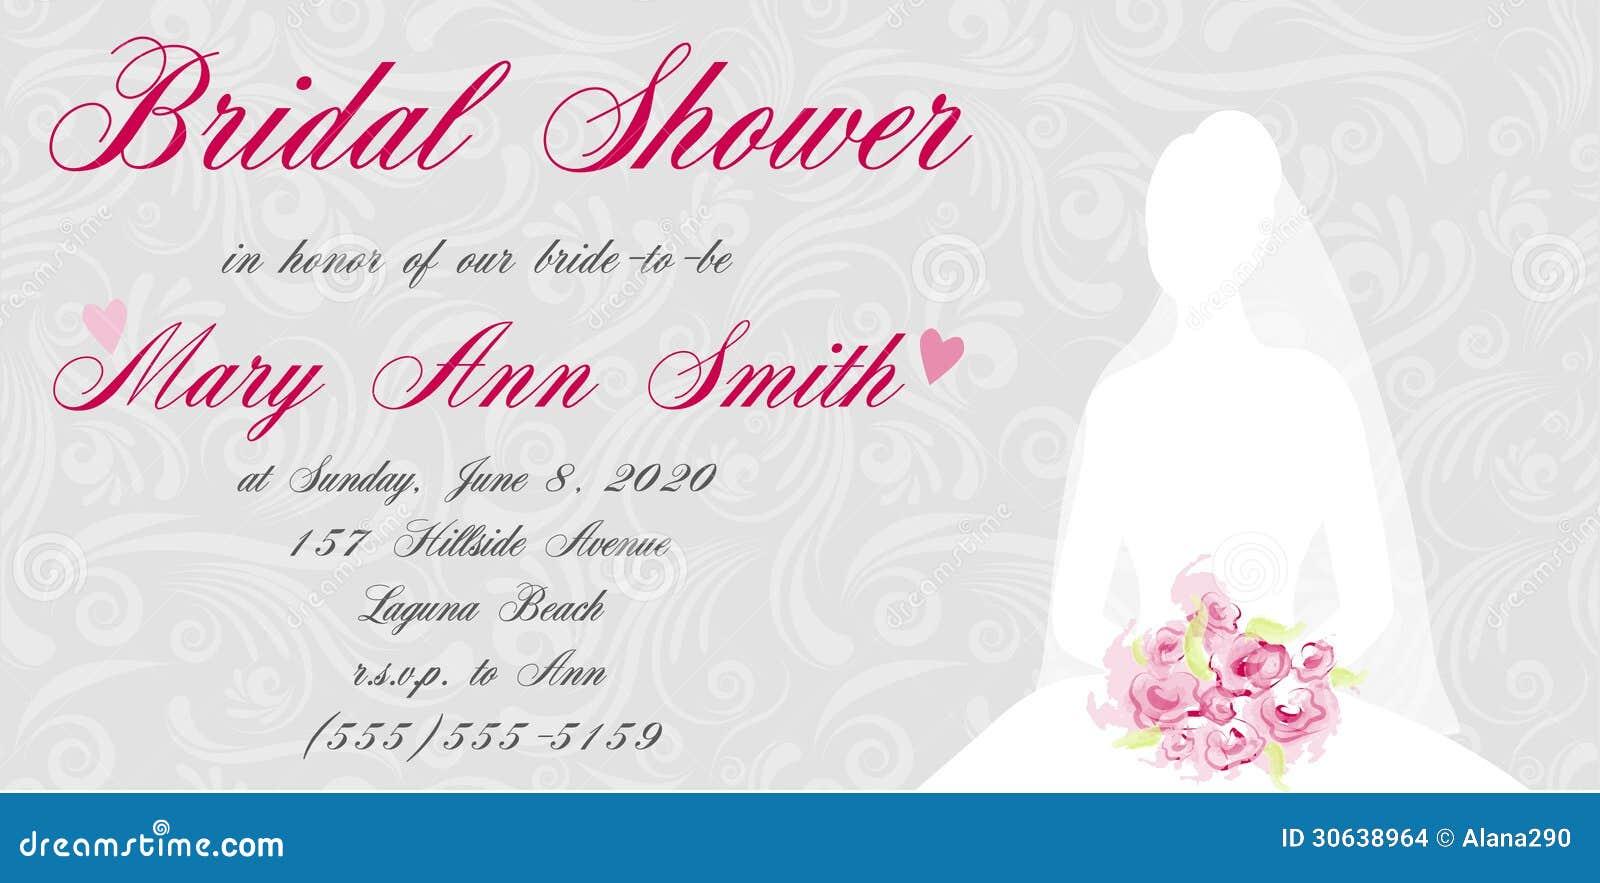 Bridal shower invitation with brides silhouette on swirls light ...